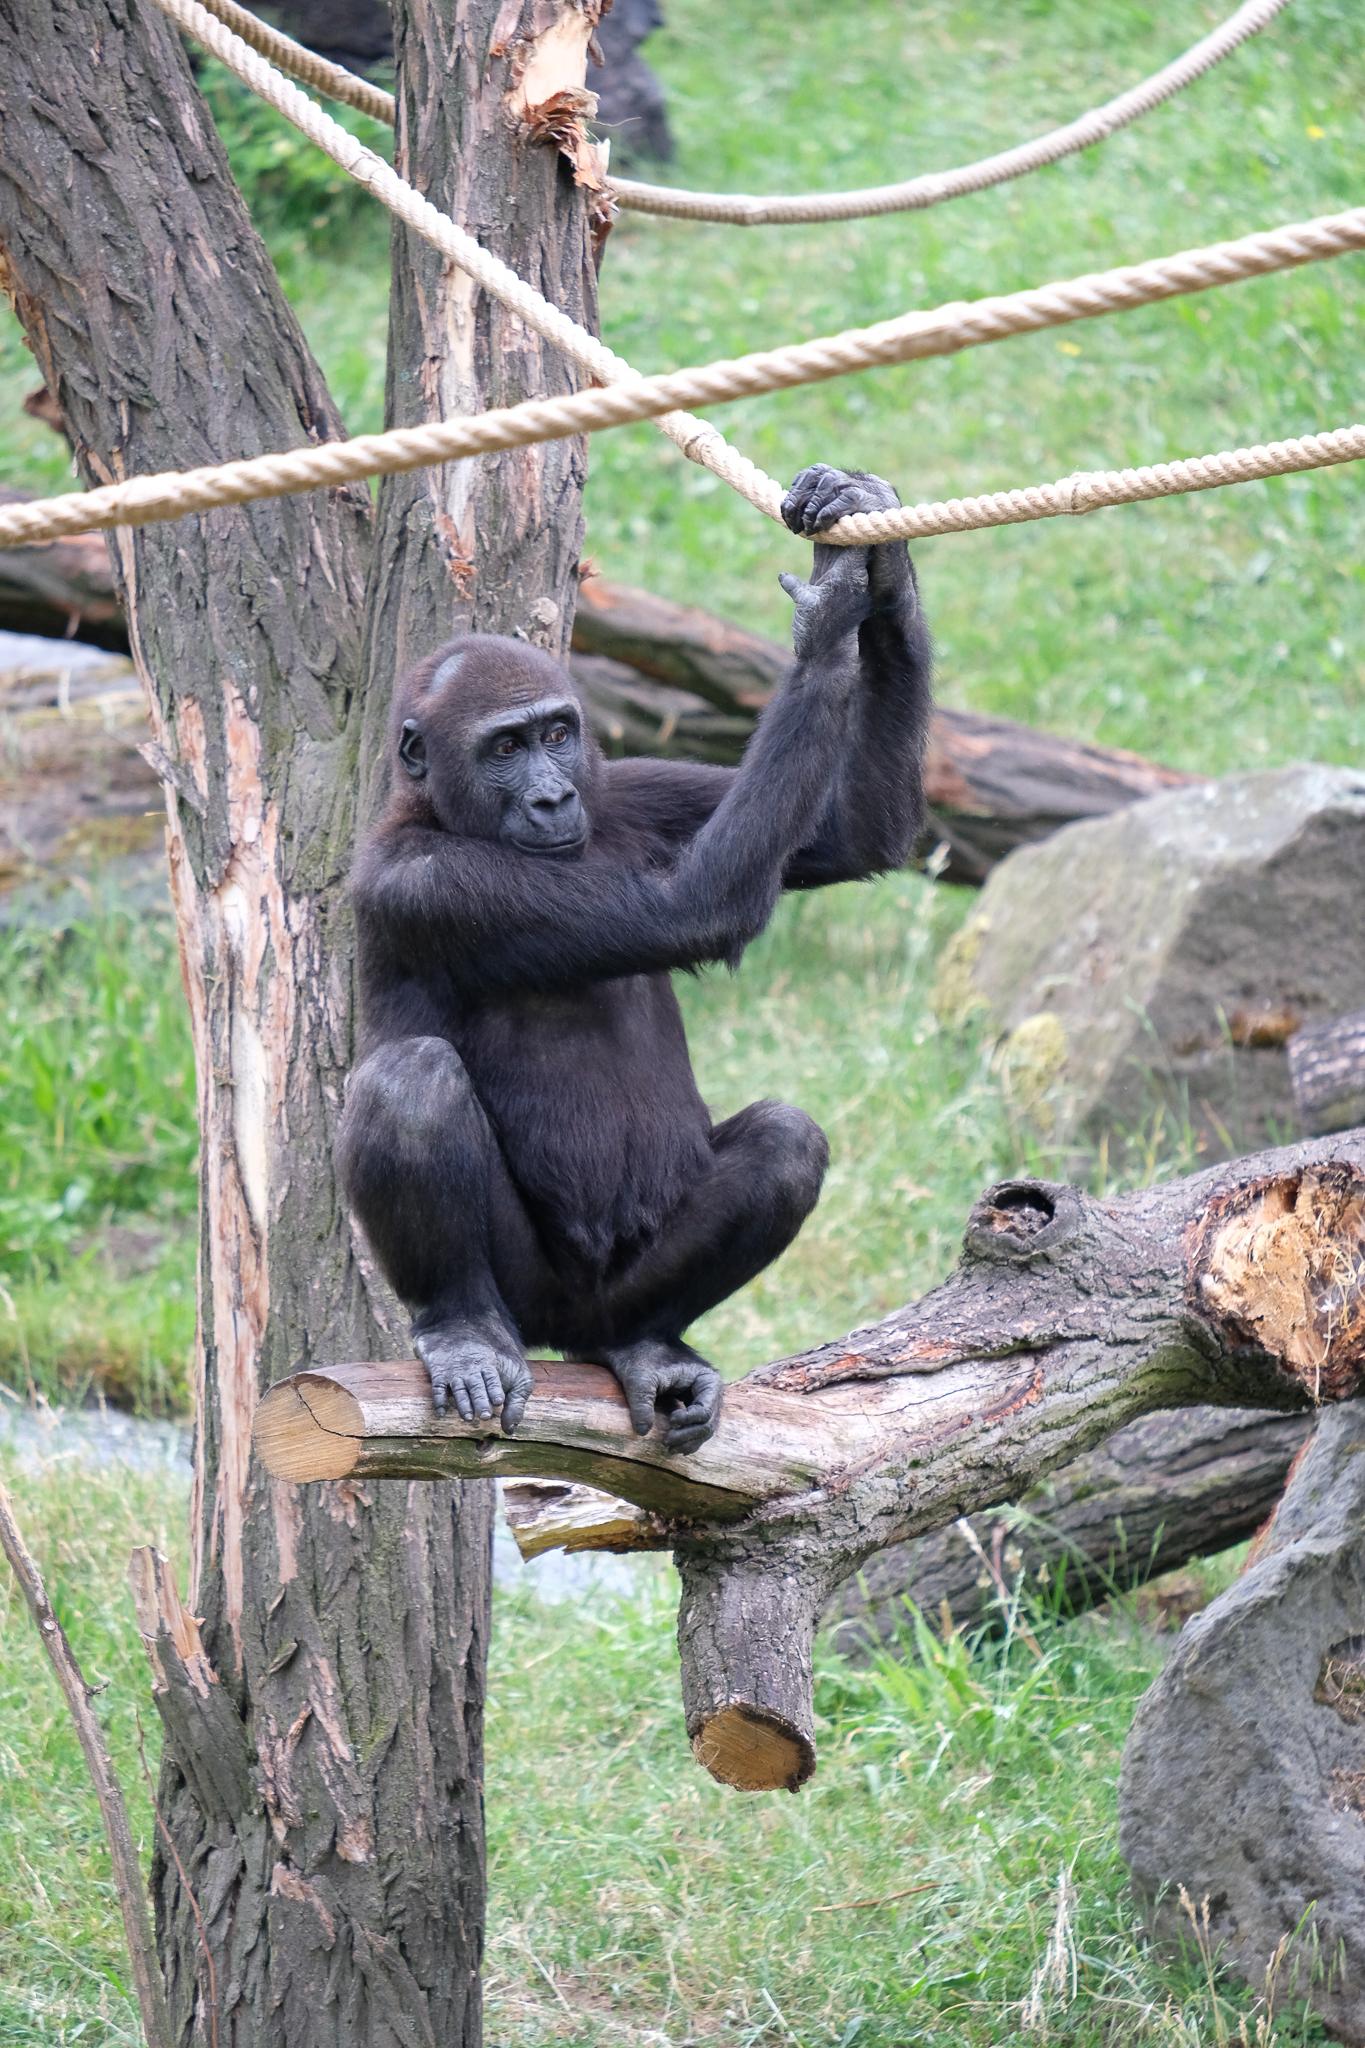 Lot of Gorillas